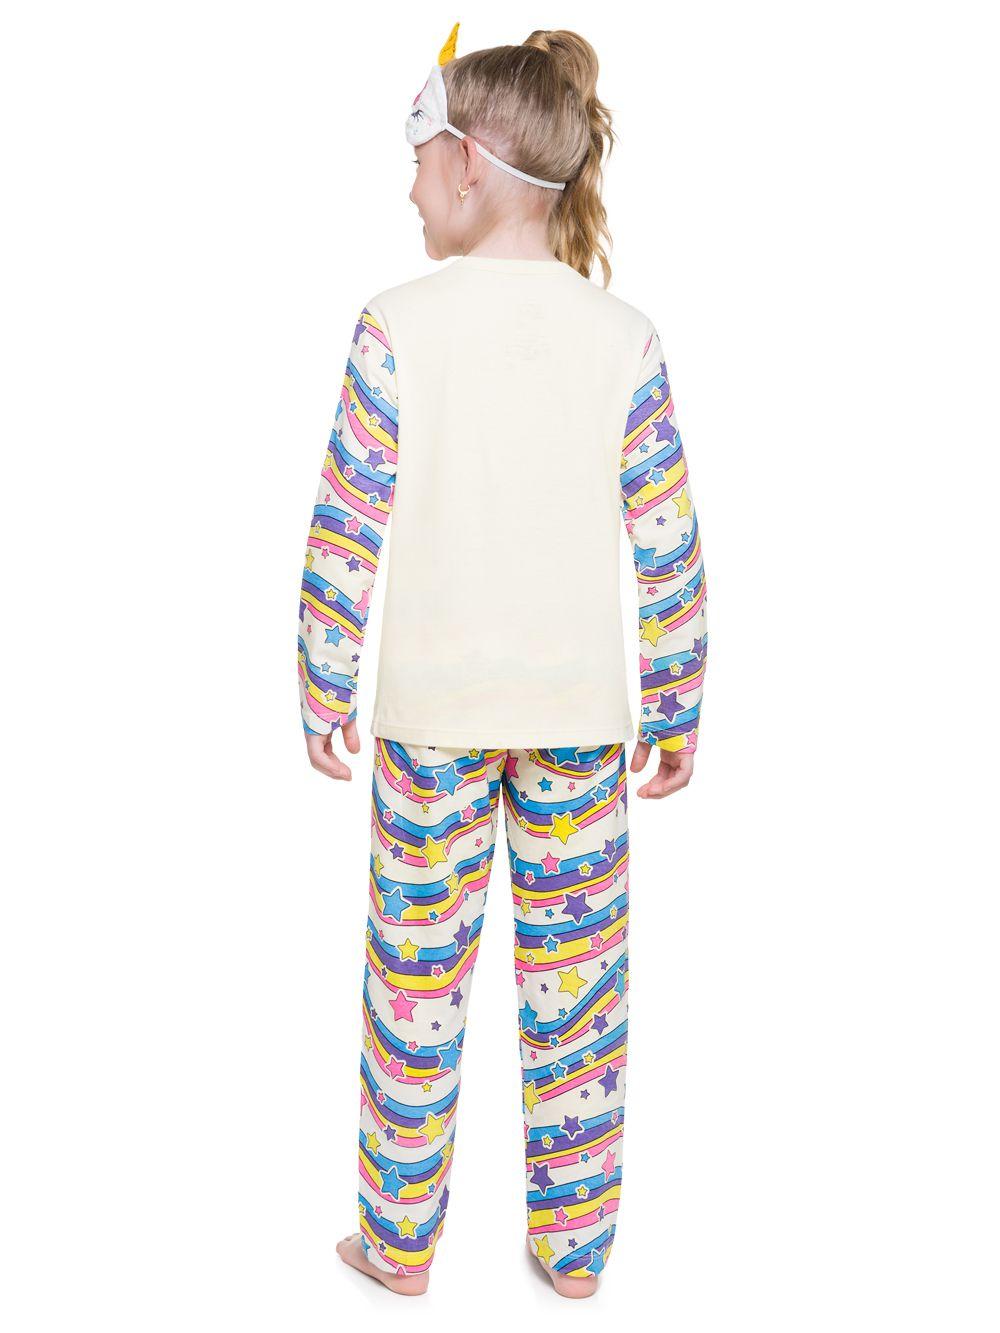 Pijama menina unicórnio colorido algodão malha penteada